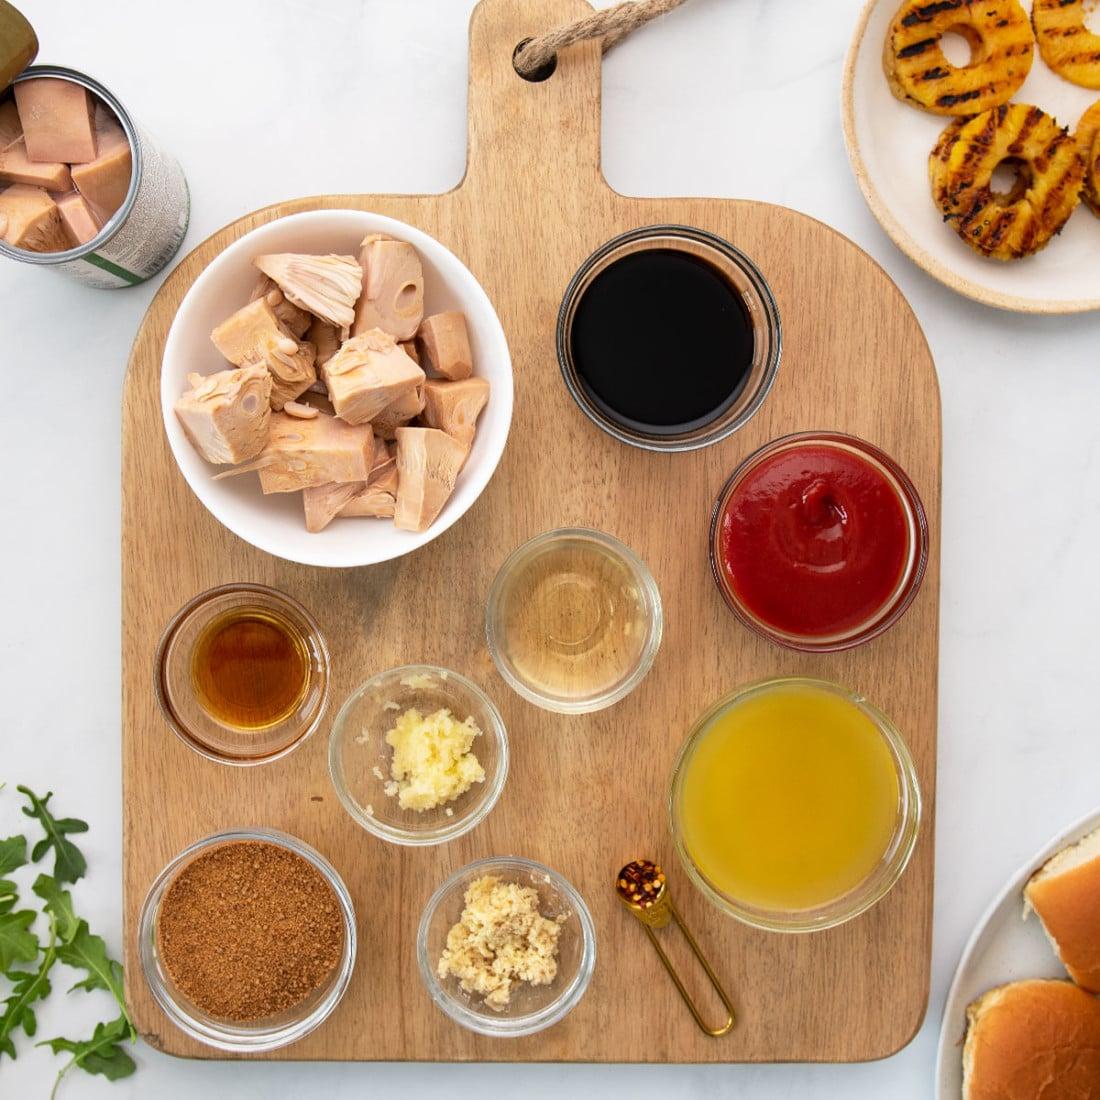 ingredients on a wooden board